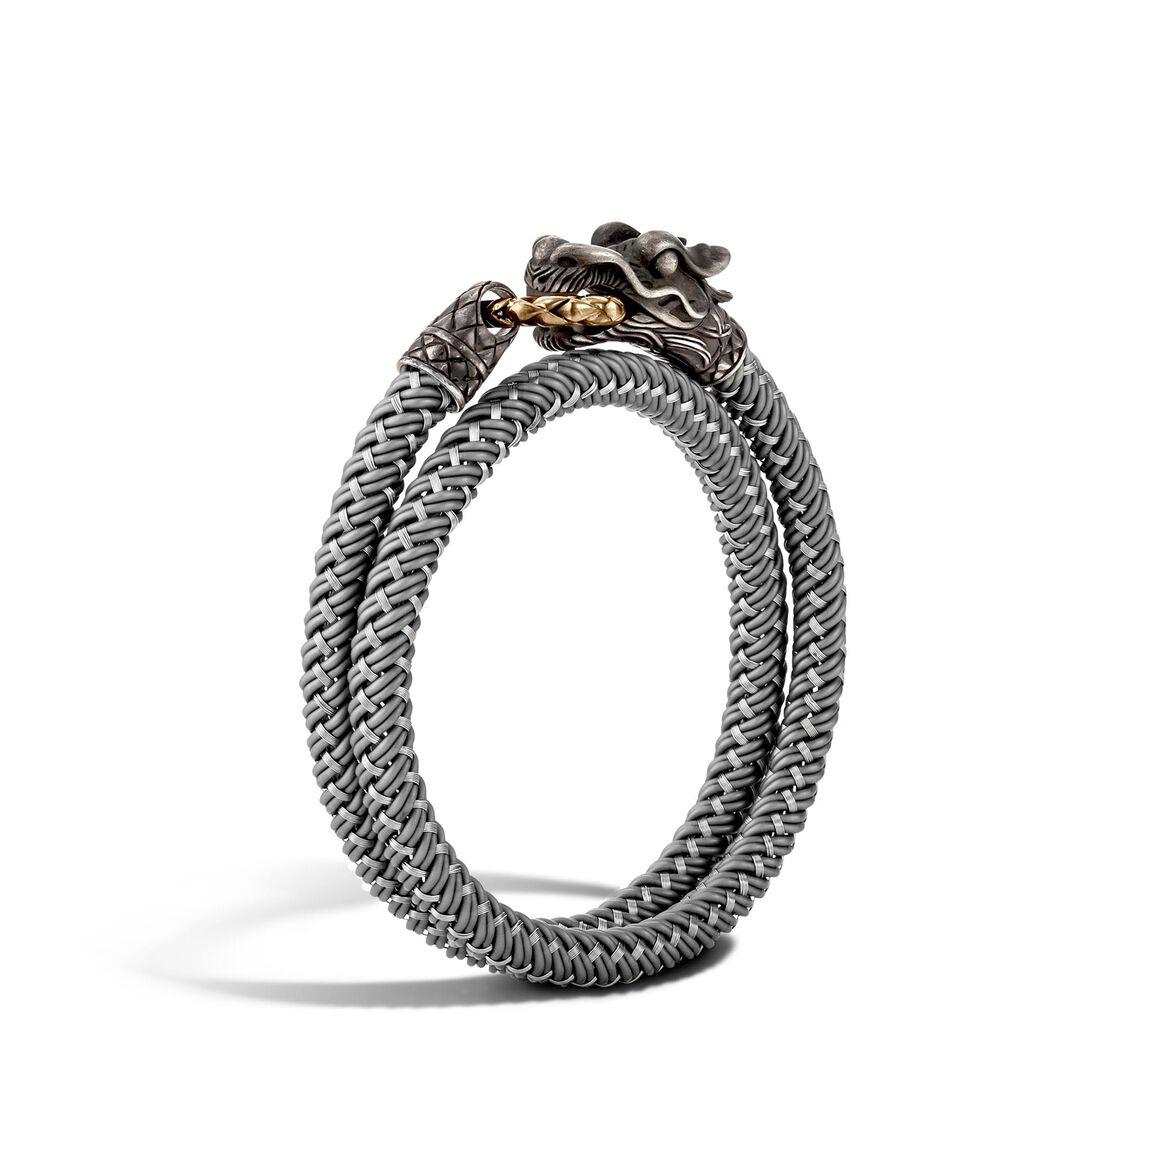 Legends Naga Wrap Bracelet In Silver and Bronze